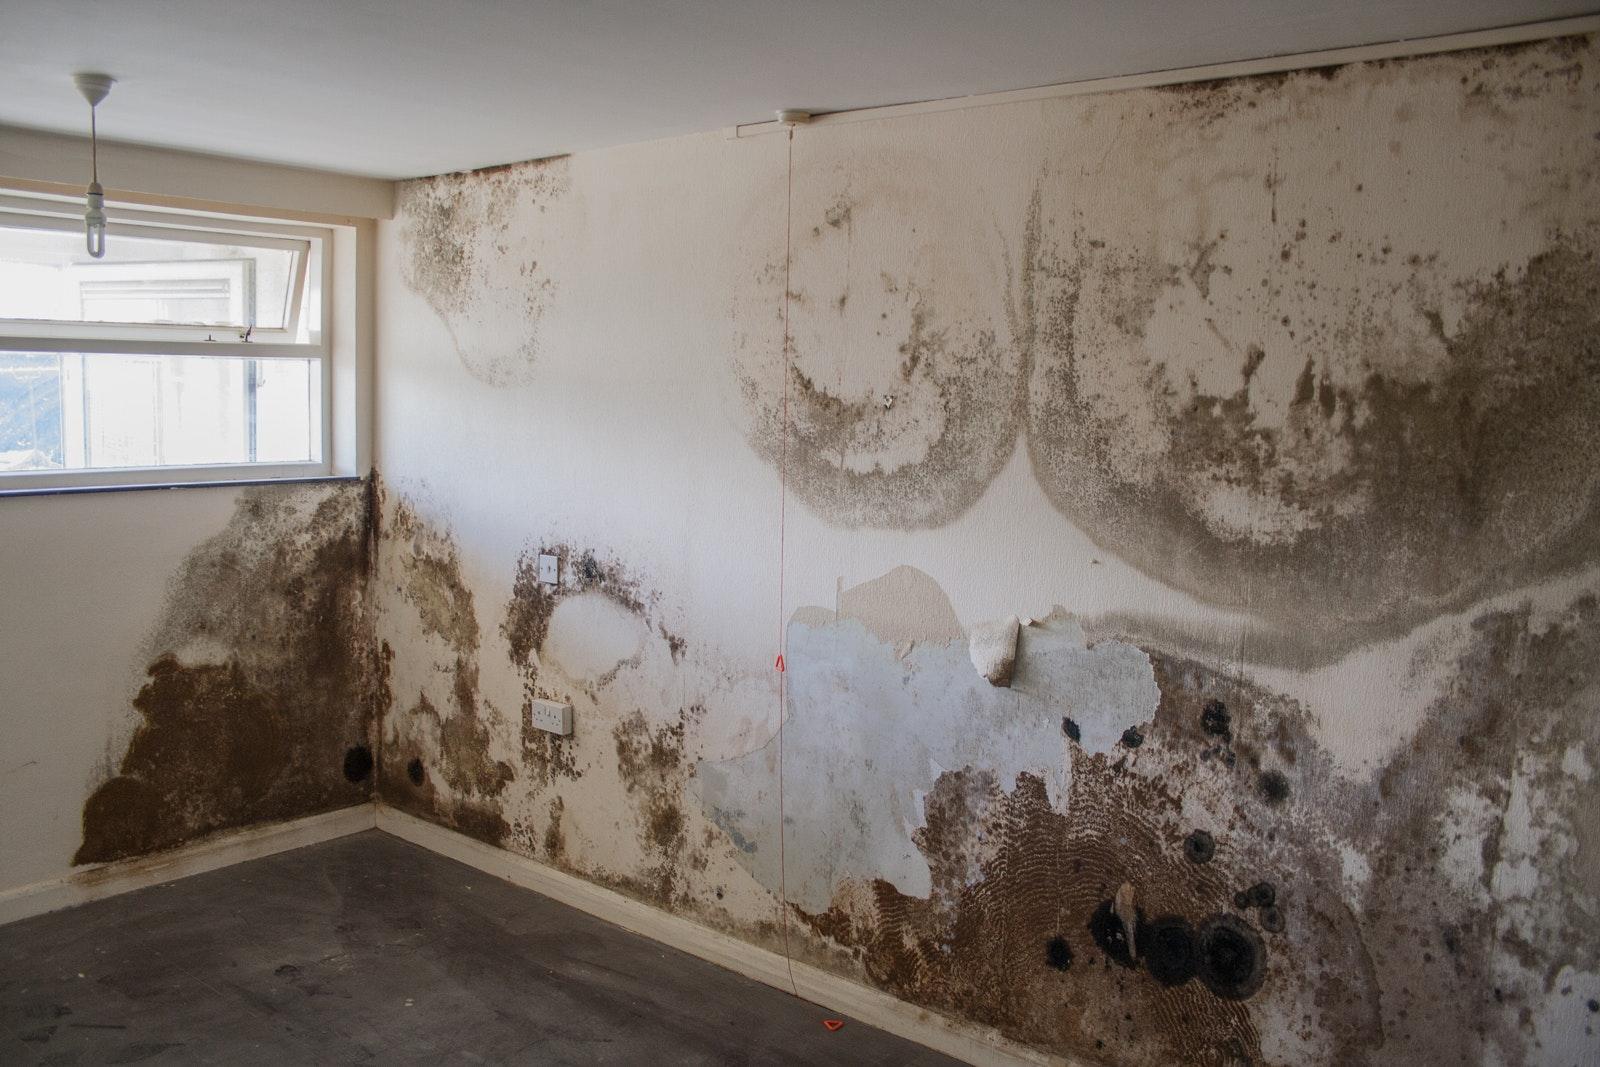 Water leaking throug wall penetration